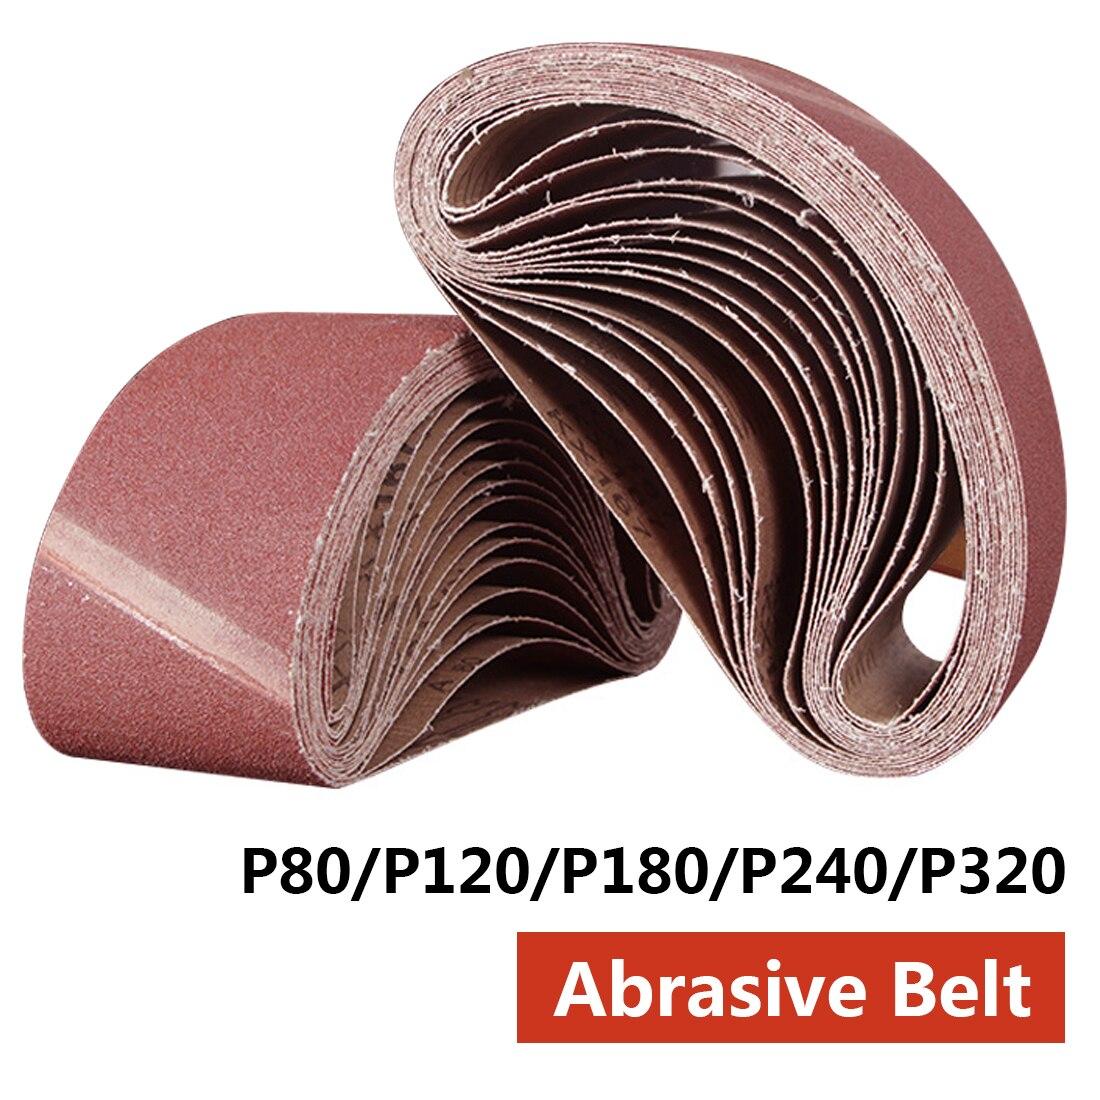 Abrasive Tool 533x75mm Sanding Belts 80-320 Grits Sandpaper Abrasive Bands For Sander Power Rotary Tools Dremel Accessories